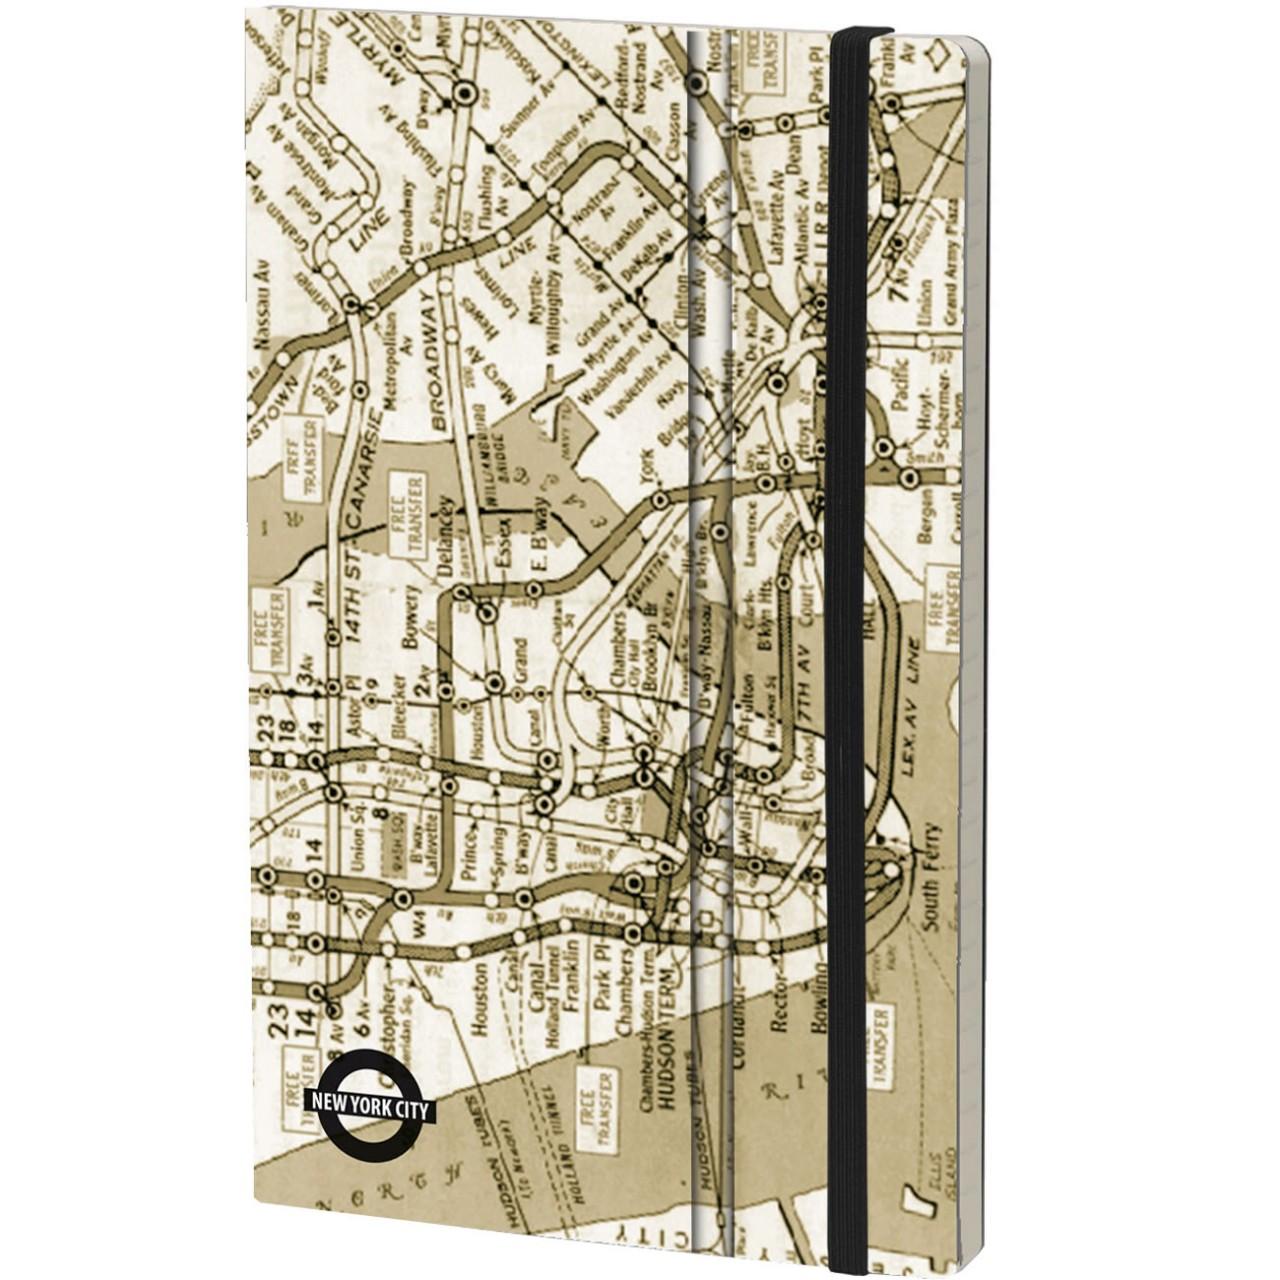 Stifflexible Notizbuch UNDERGROUND (New York) 13 x 21 cm 192 S., NYC VINTAGE